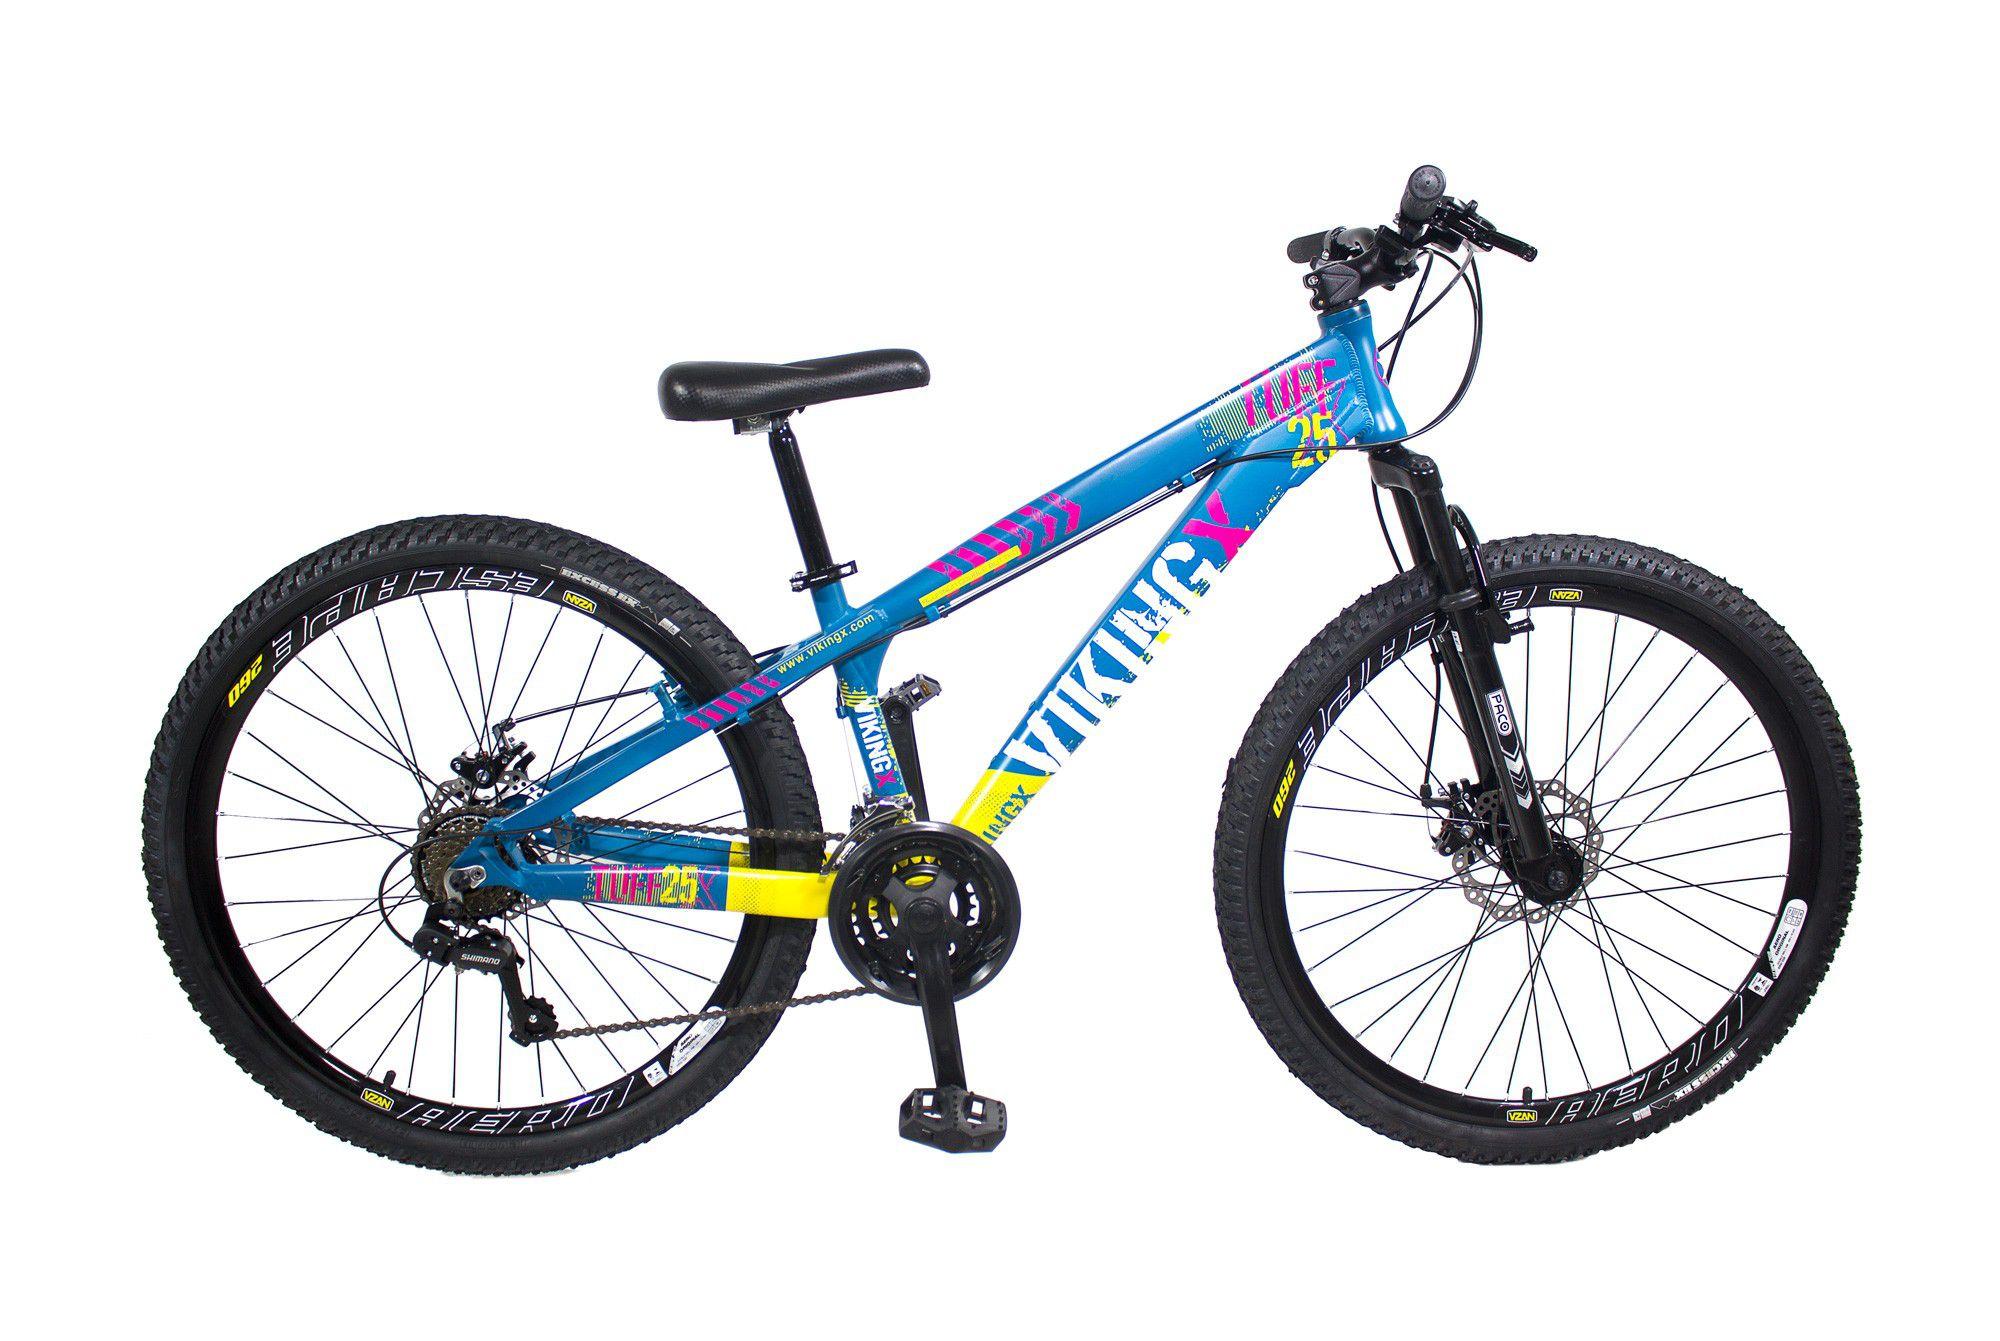 Bicicleta Vikingx Tuff X25 Shimano Freio A Disco Azul/Amarelo